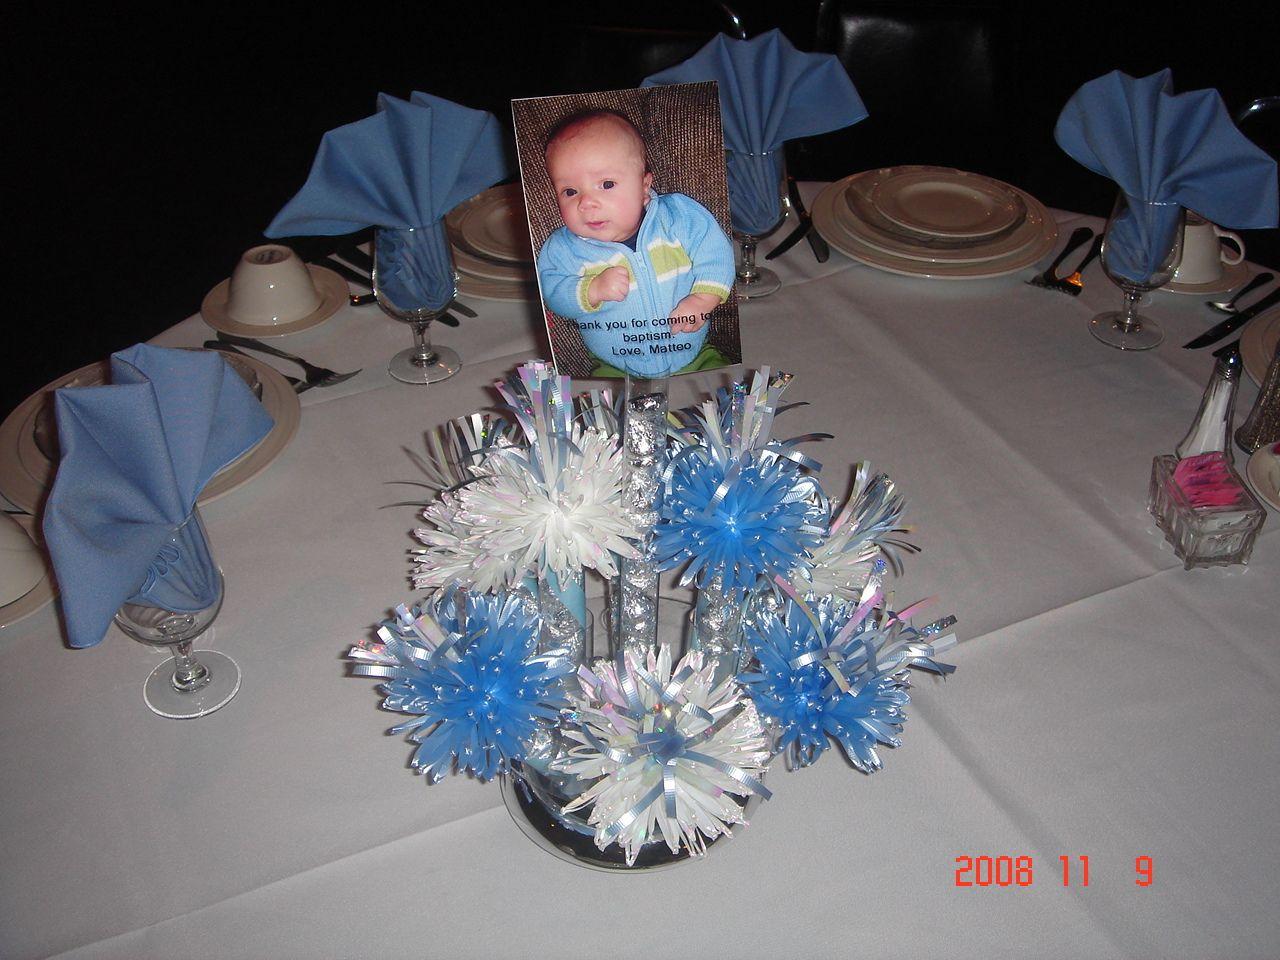 Boy Baptism Decorations Baptism Decorations Ideas How To Make A Baptism Centerpiece For